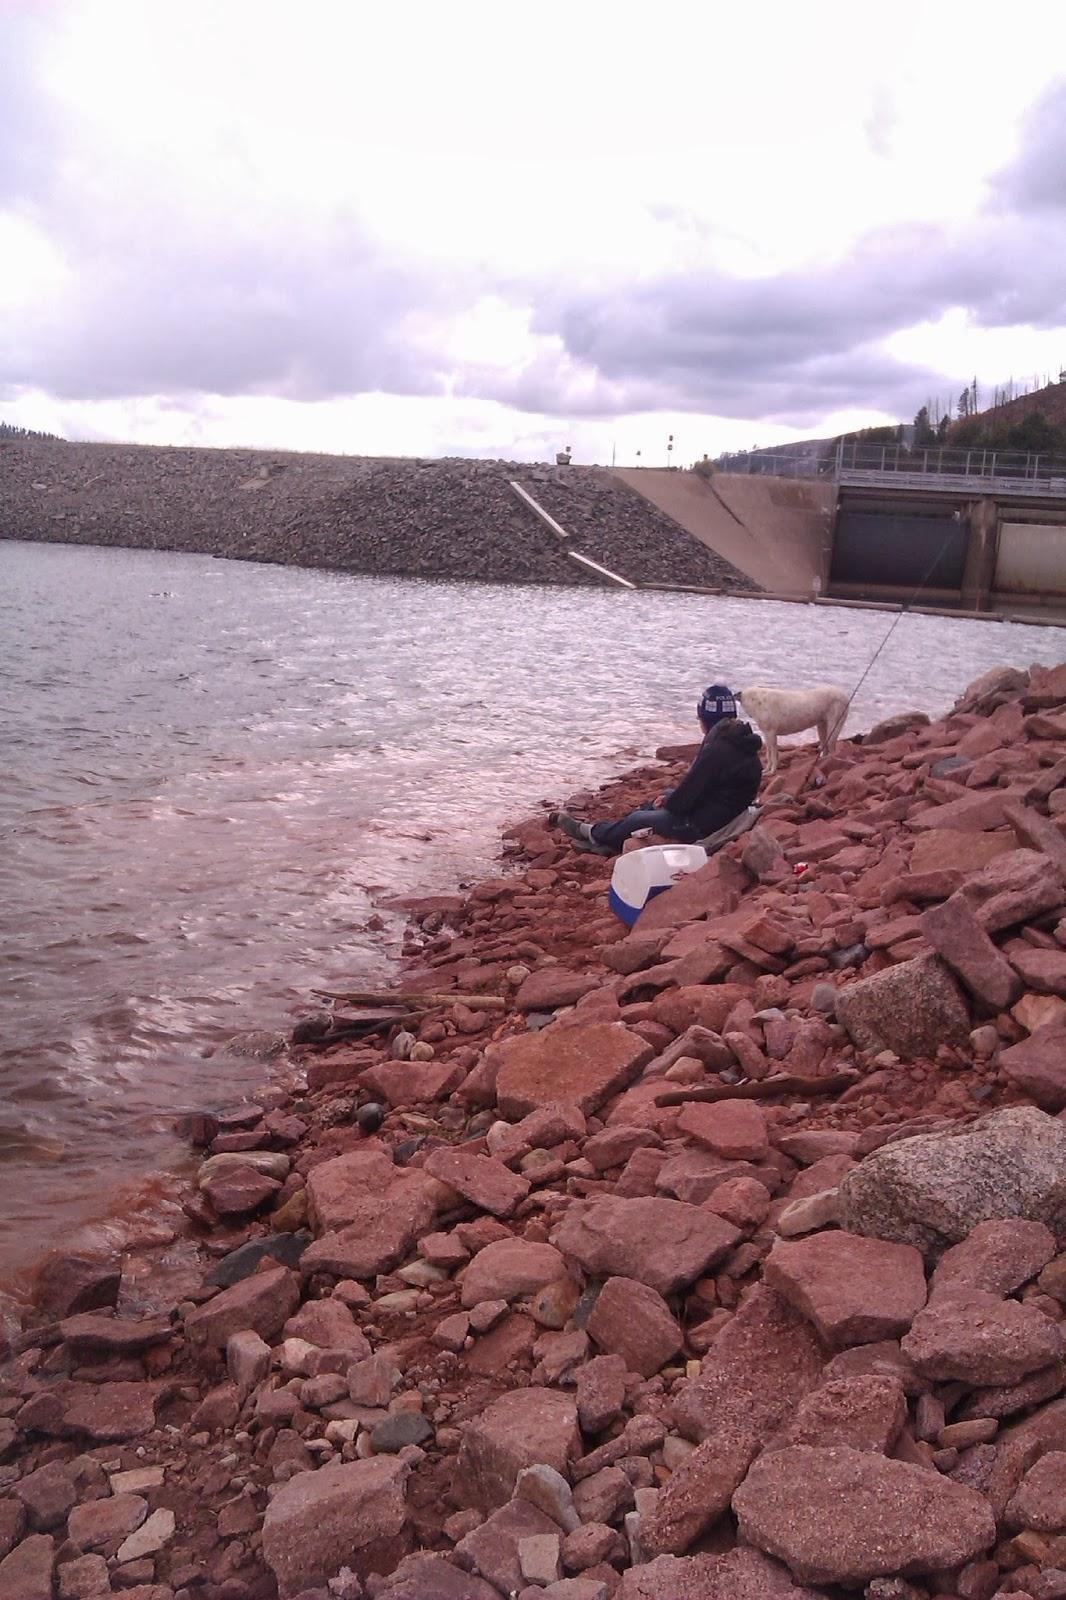 Durango southwest colorado fishing october 2013 for Fishing in durango co